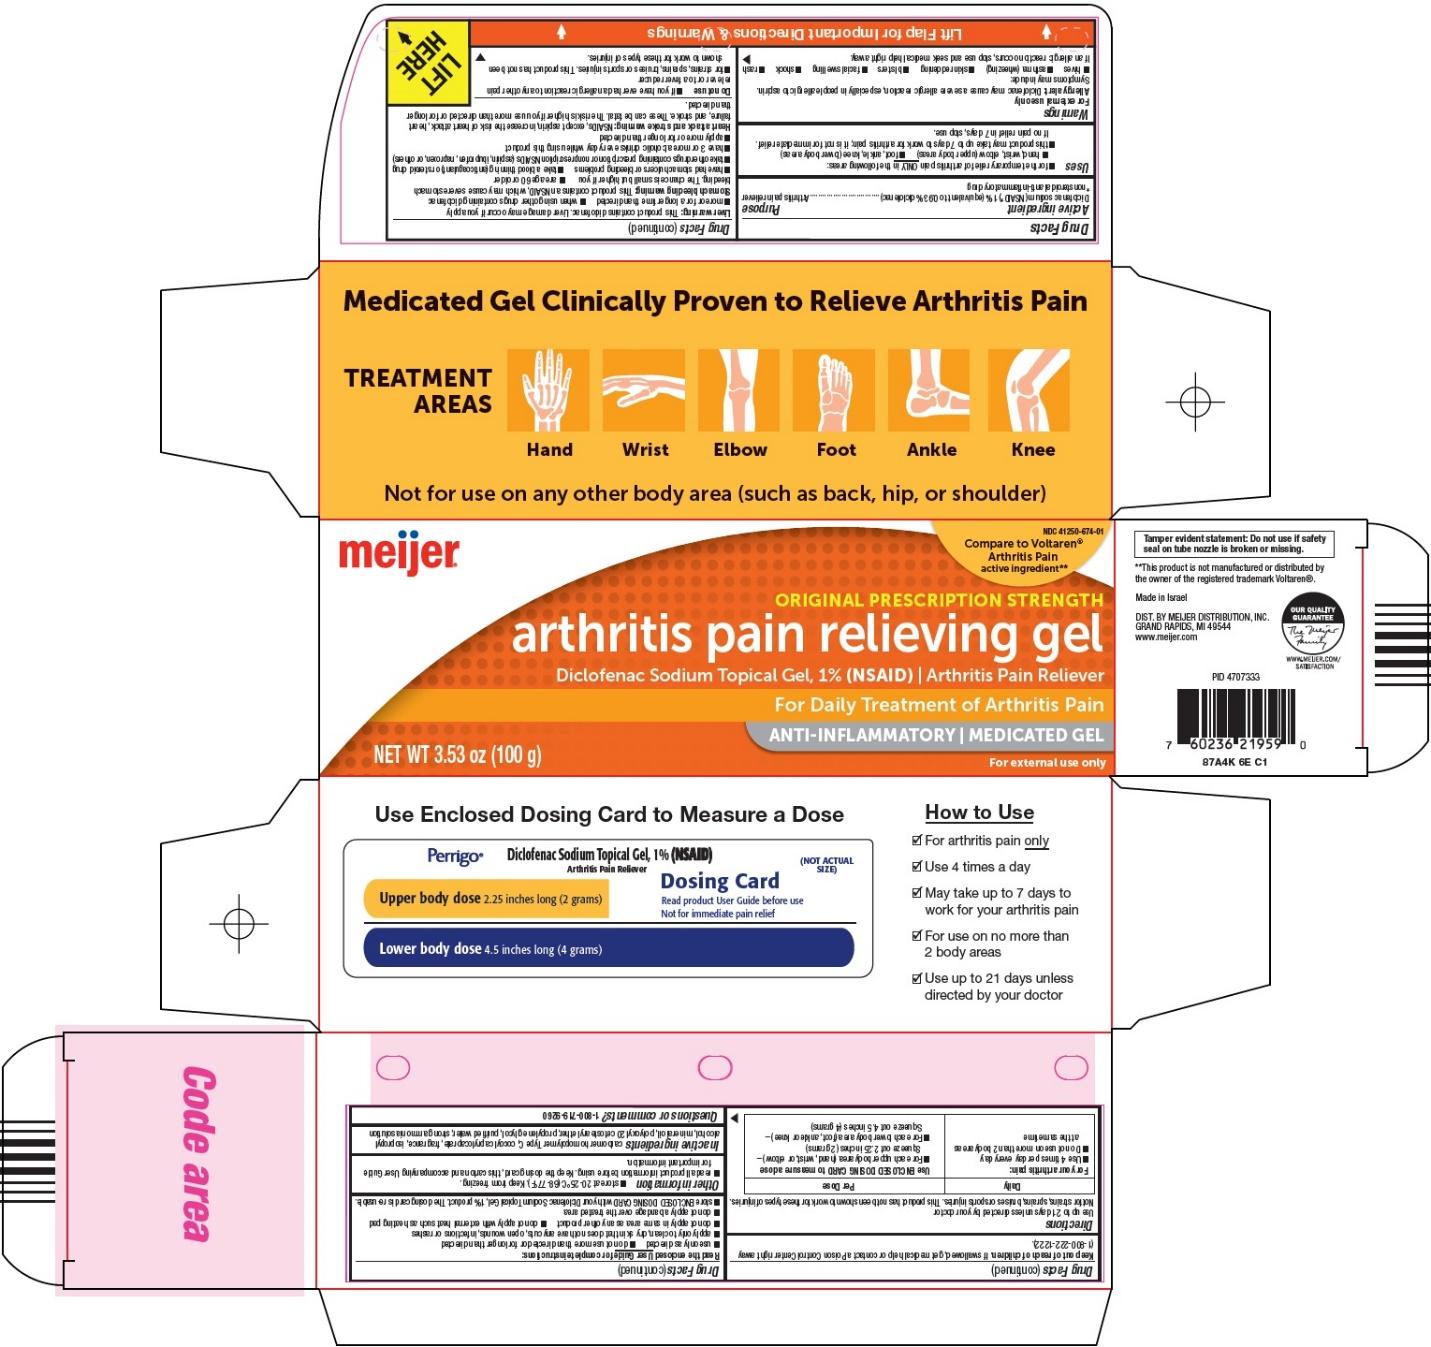 arthritis pain relieving gel image